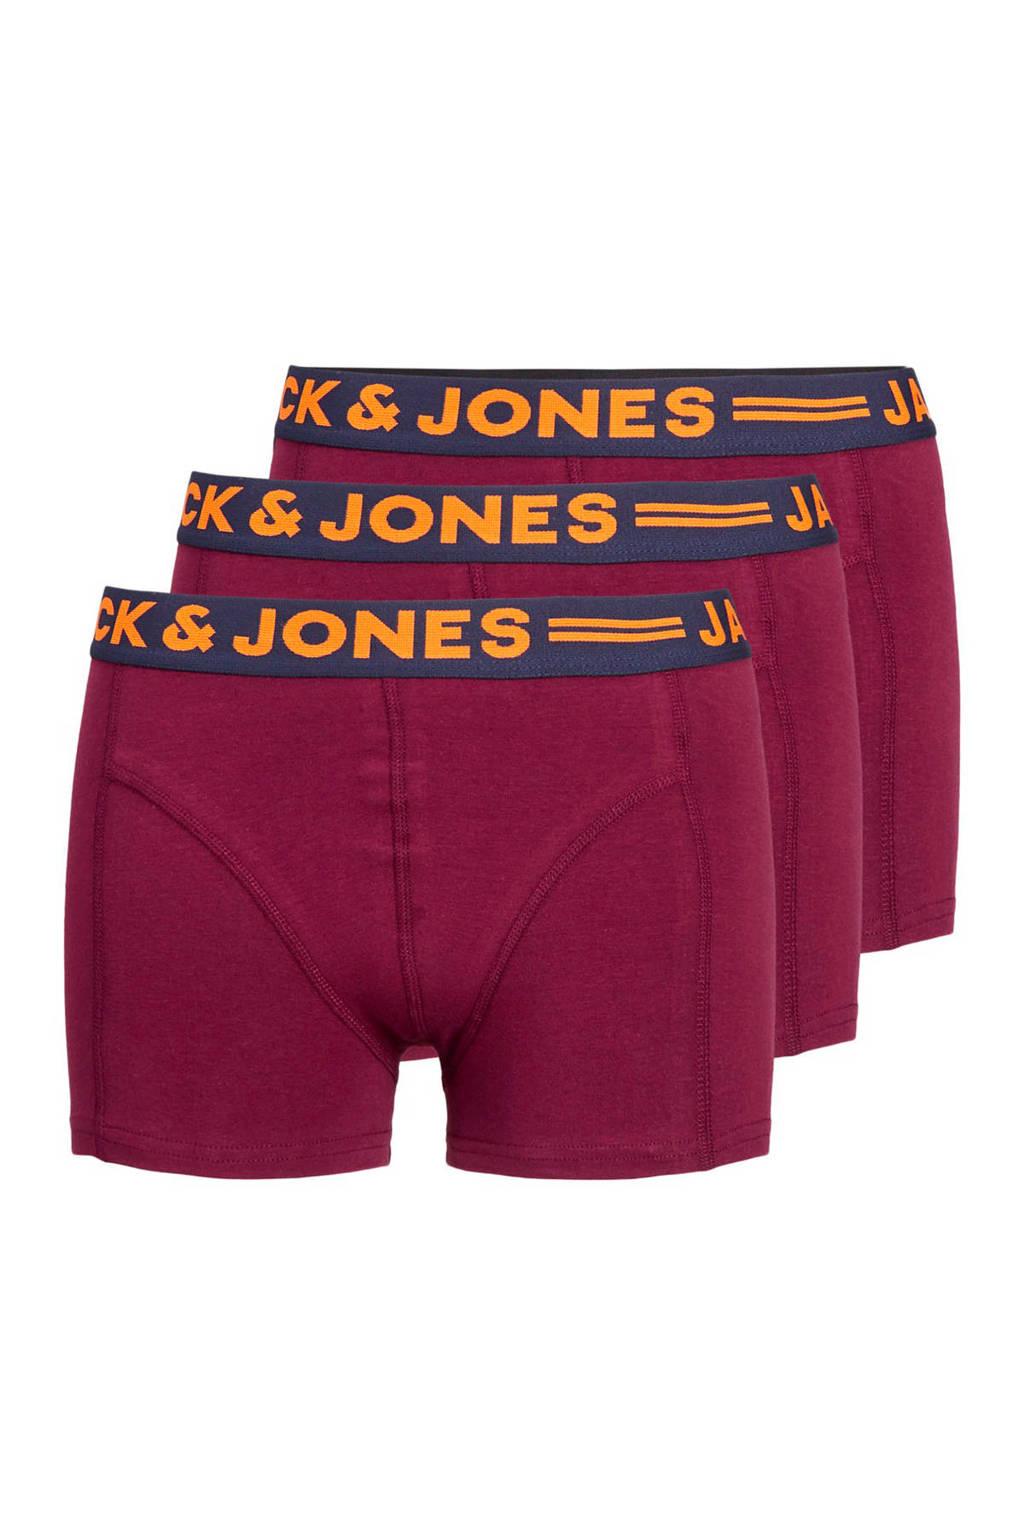 JACK & JONES PLUS SIZE boxershort (set van 3), Bordeaux/marine/grijs